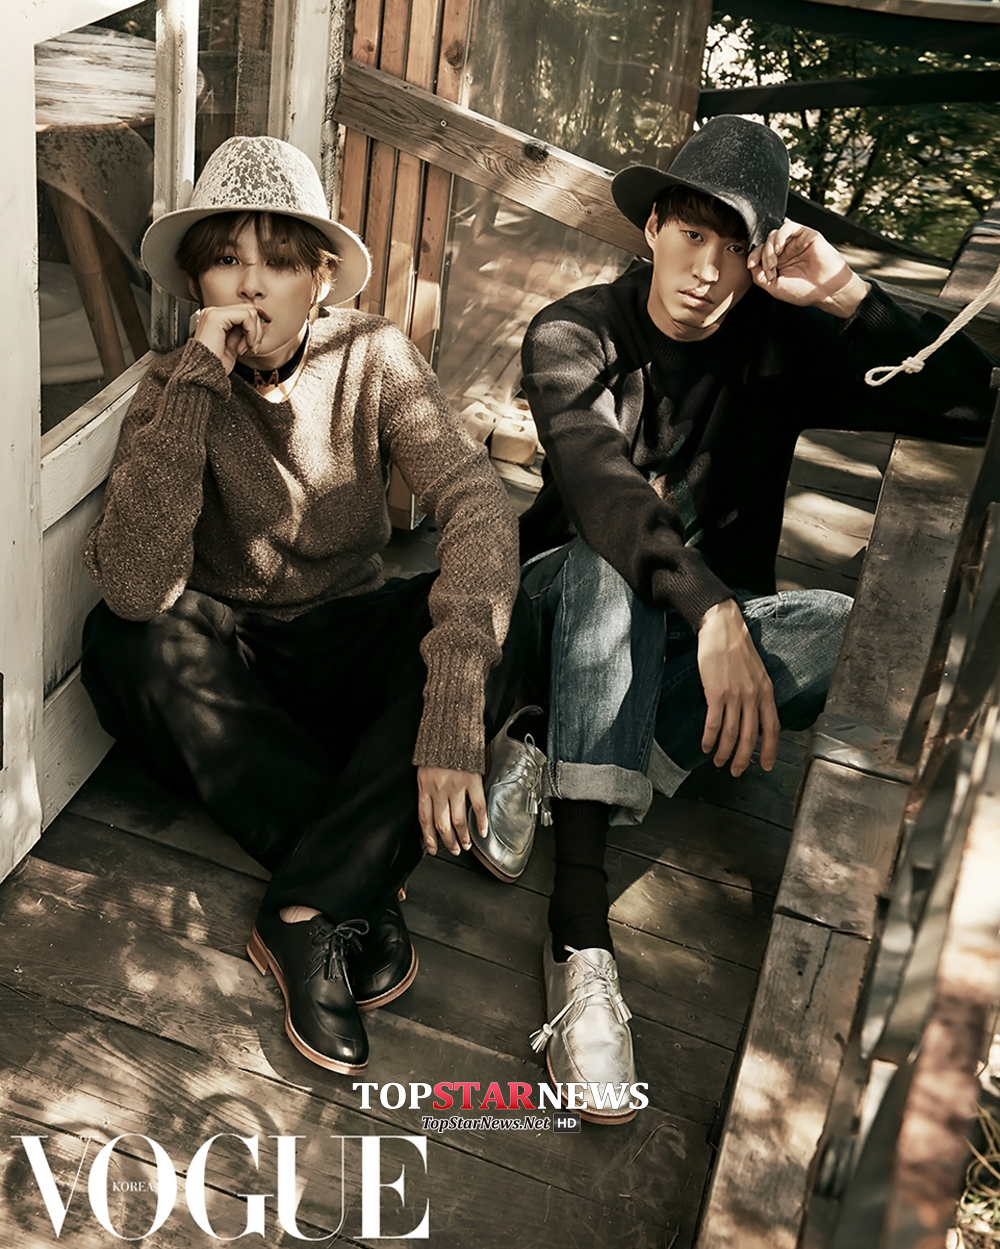 EPIK HIGH的Tablo也是和老婆姜惠貞短暫是YG內夫妻檔,Tablo在2011年加入老婆所屬YG娛樂,姜惠貞1997到2013年都隸屬YG